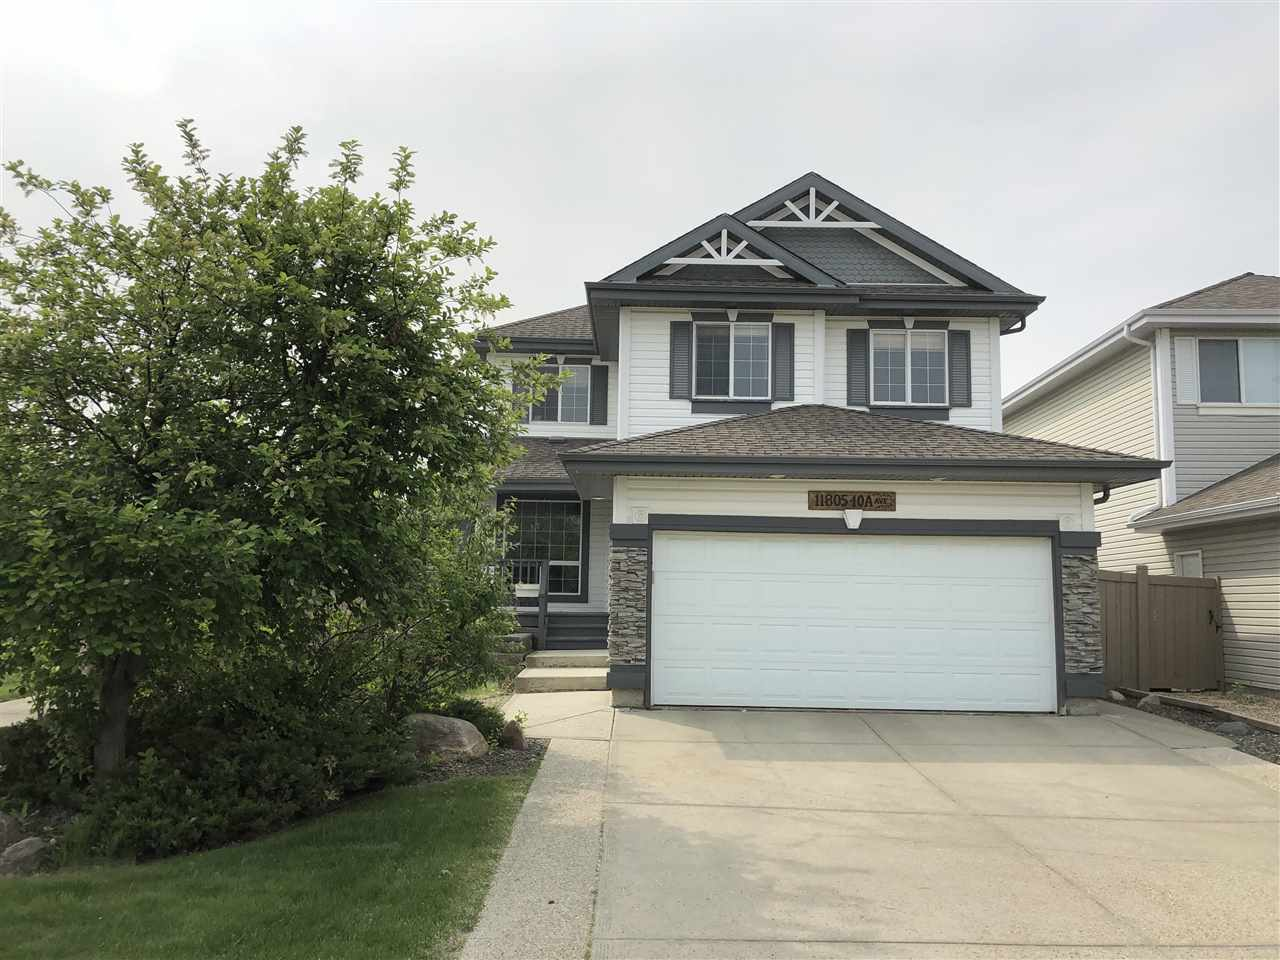 11805 10A Avenue Edmonton Alberta